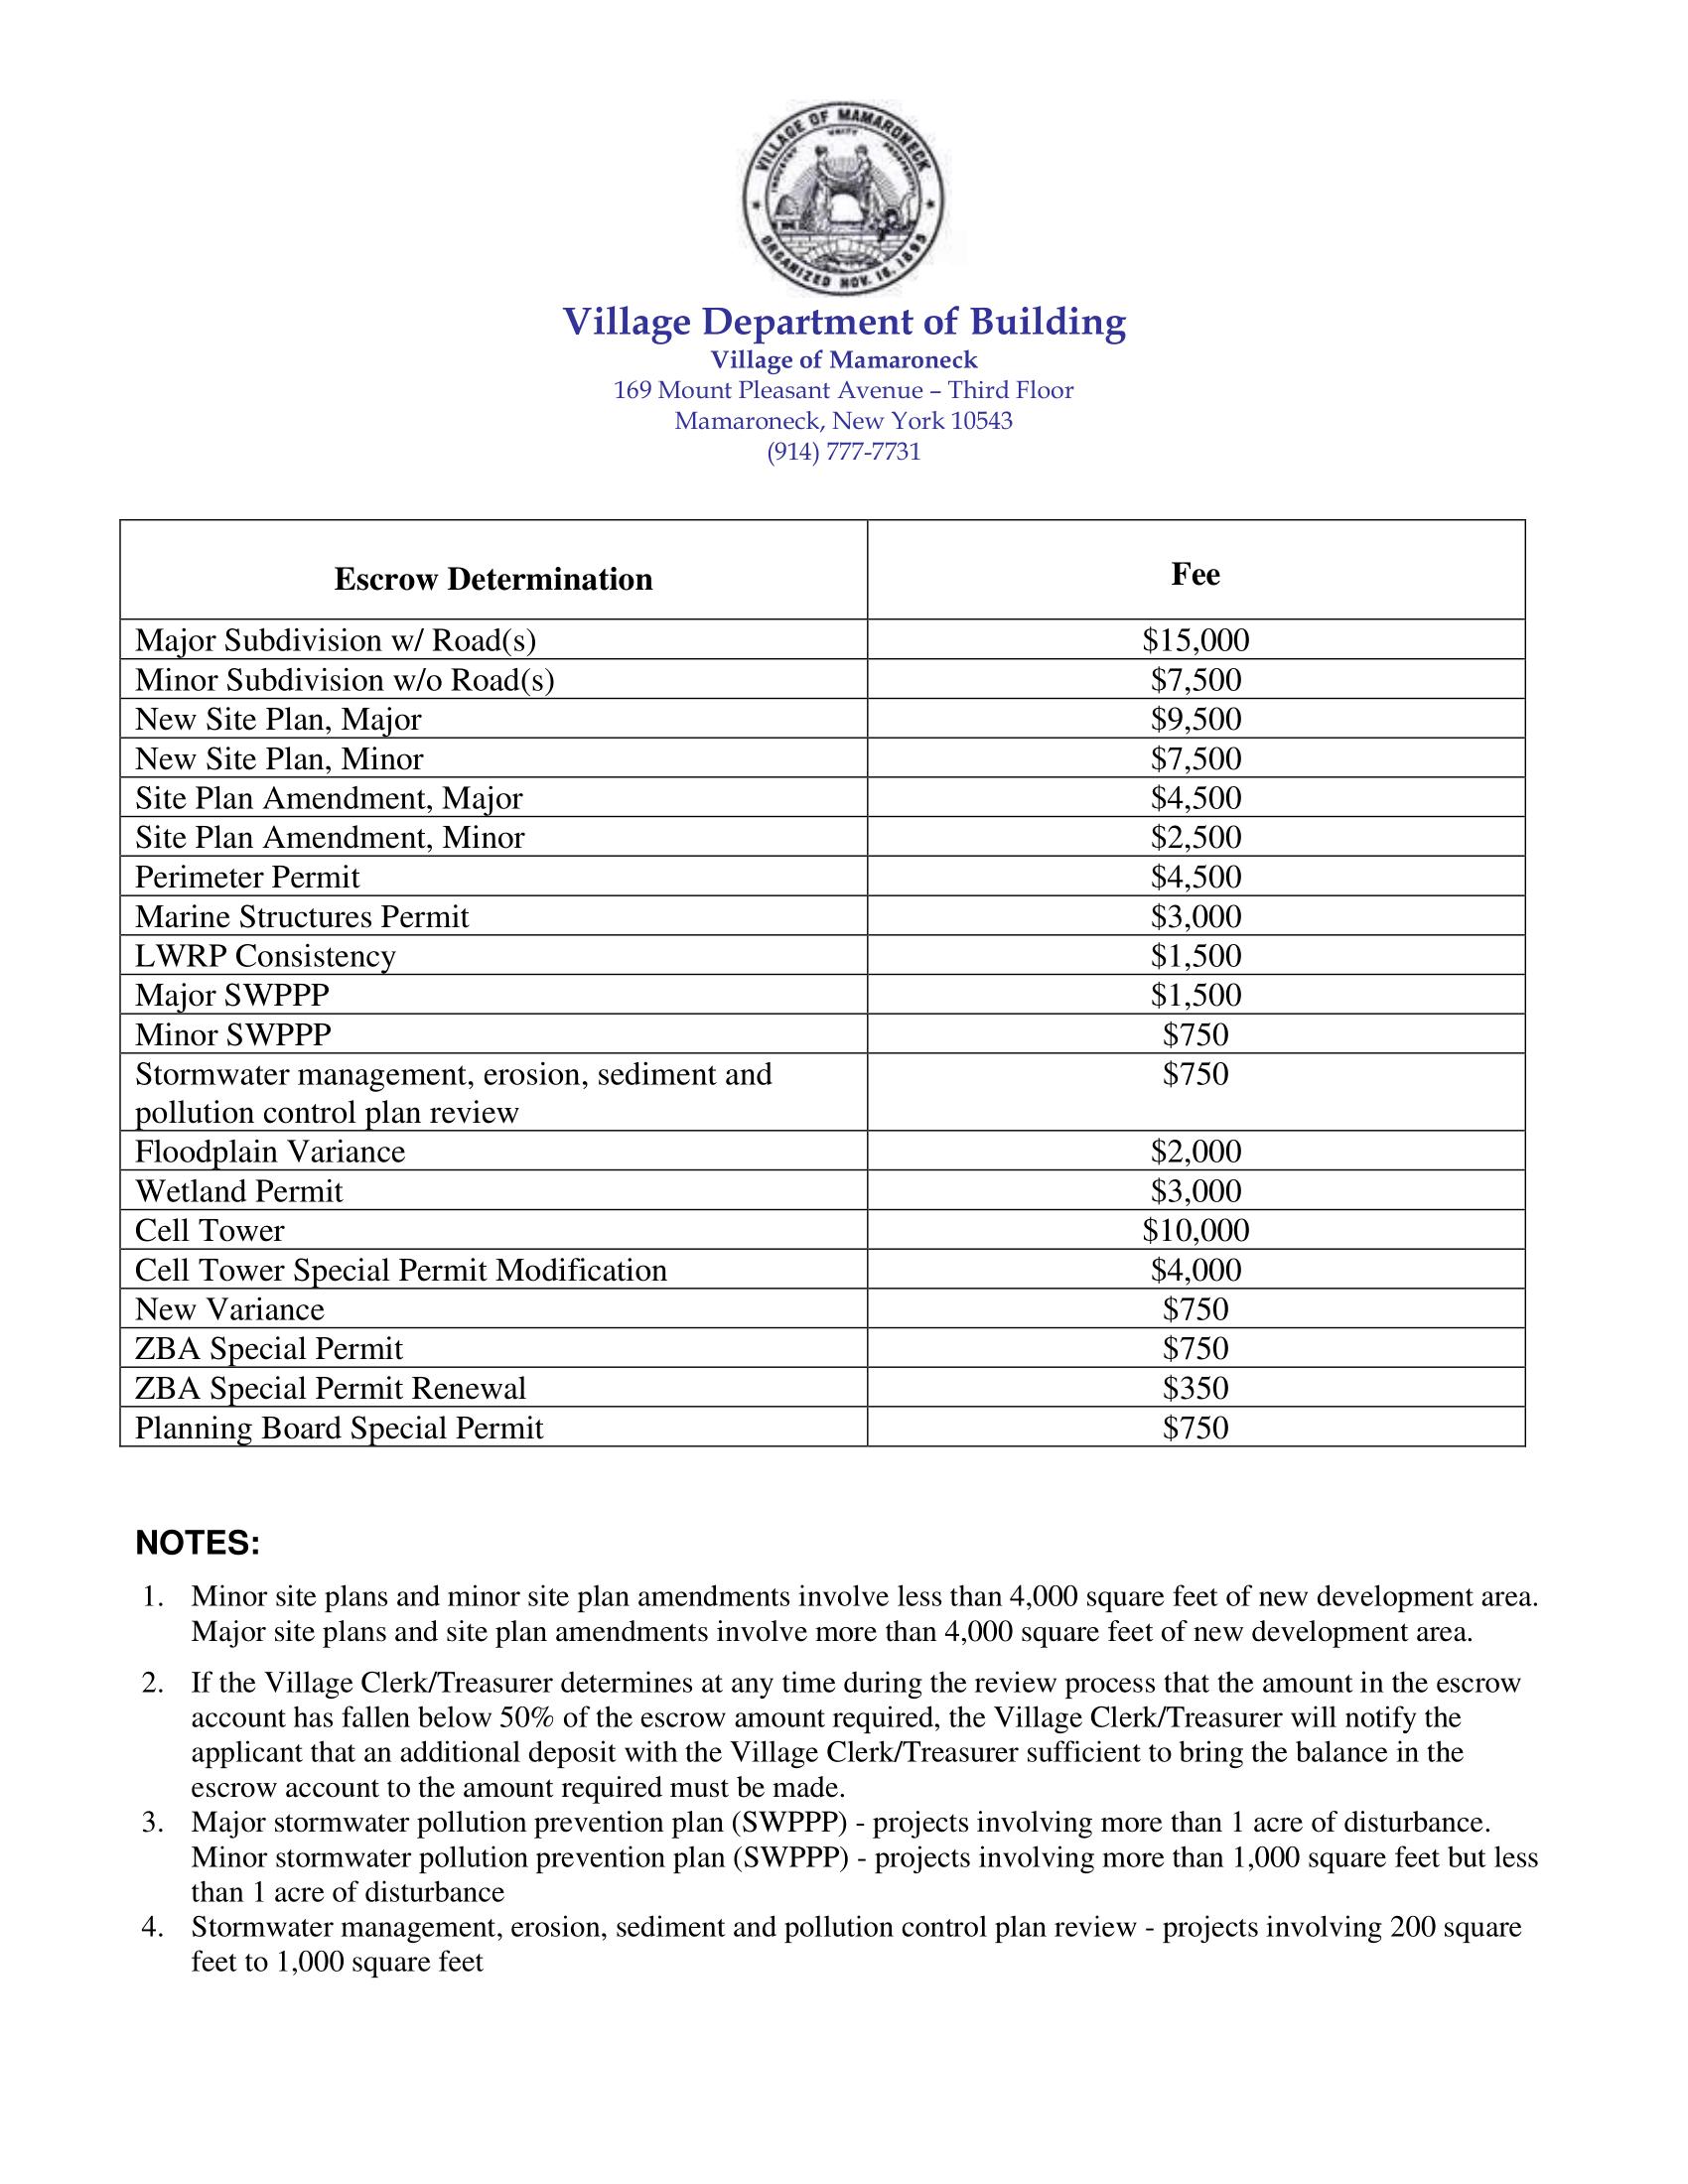 Escrow Fee Schedule